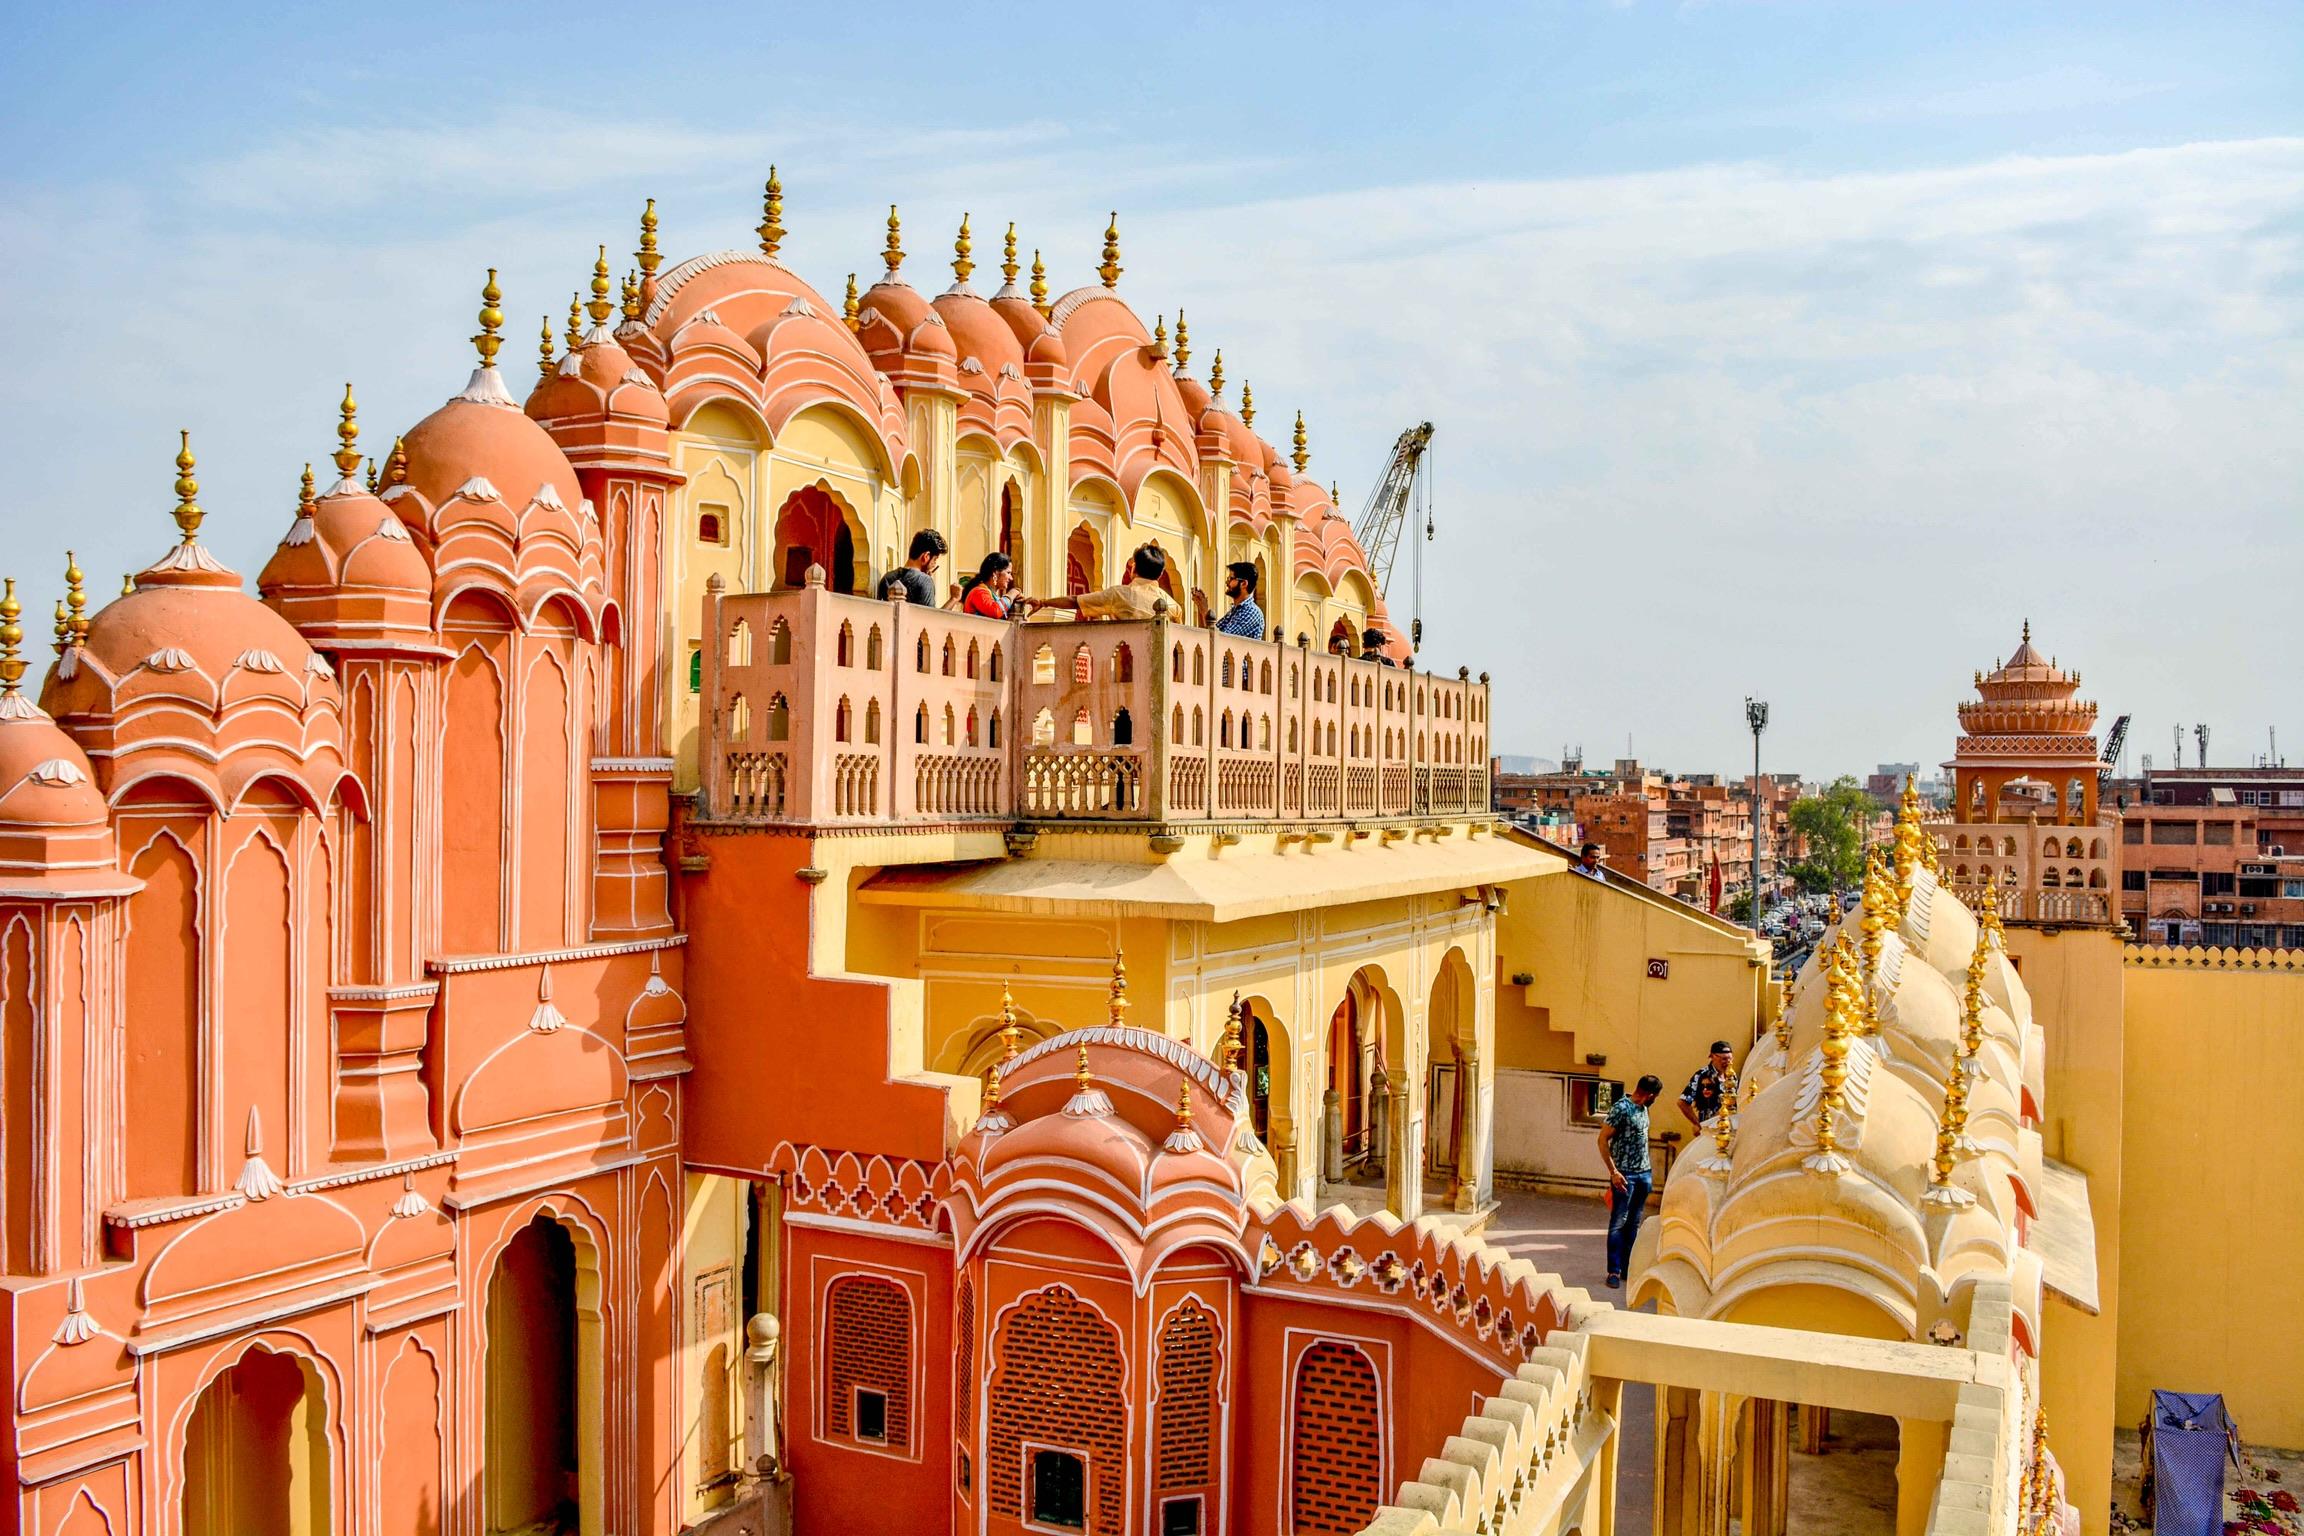 India - Jaipur, Rajasthan